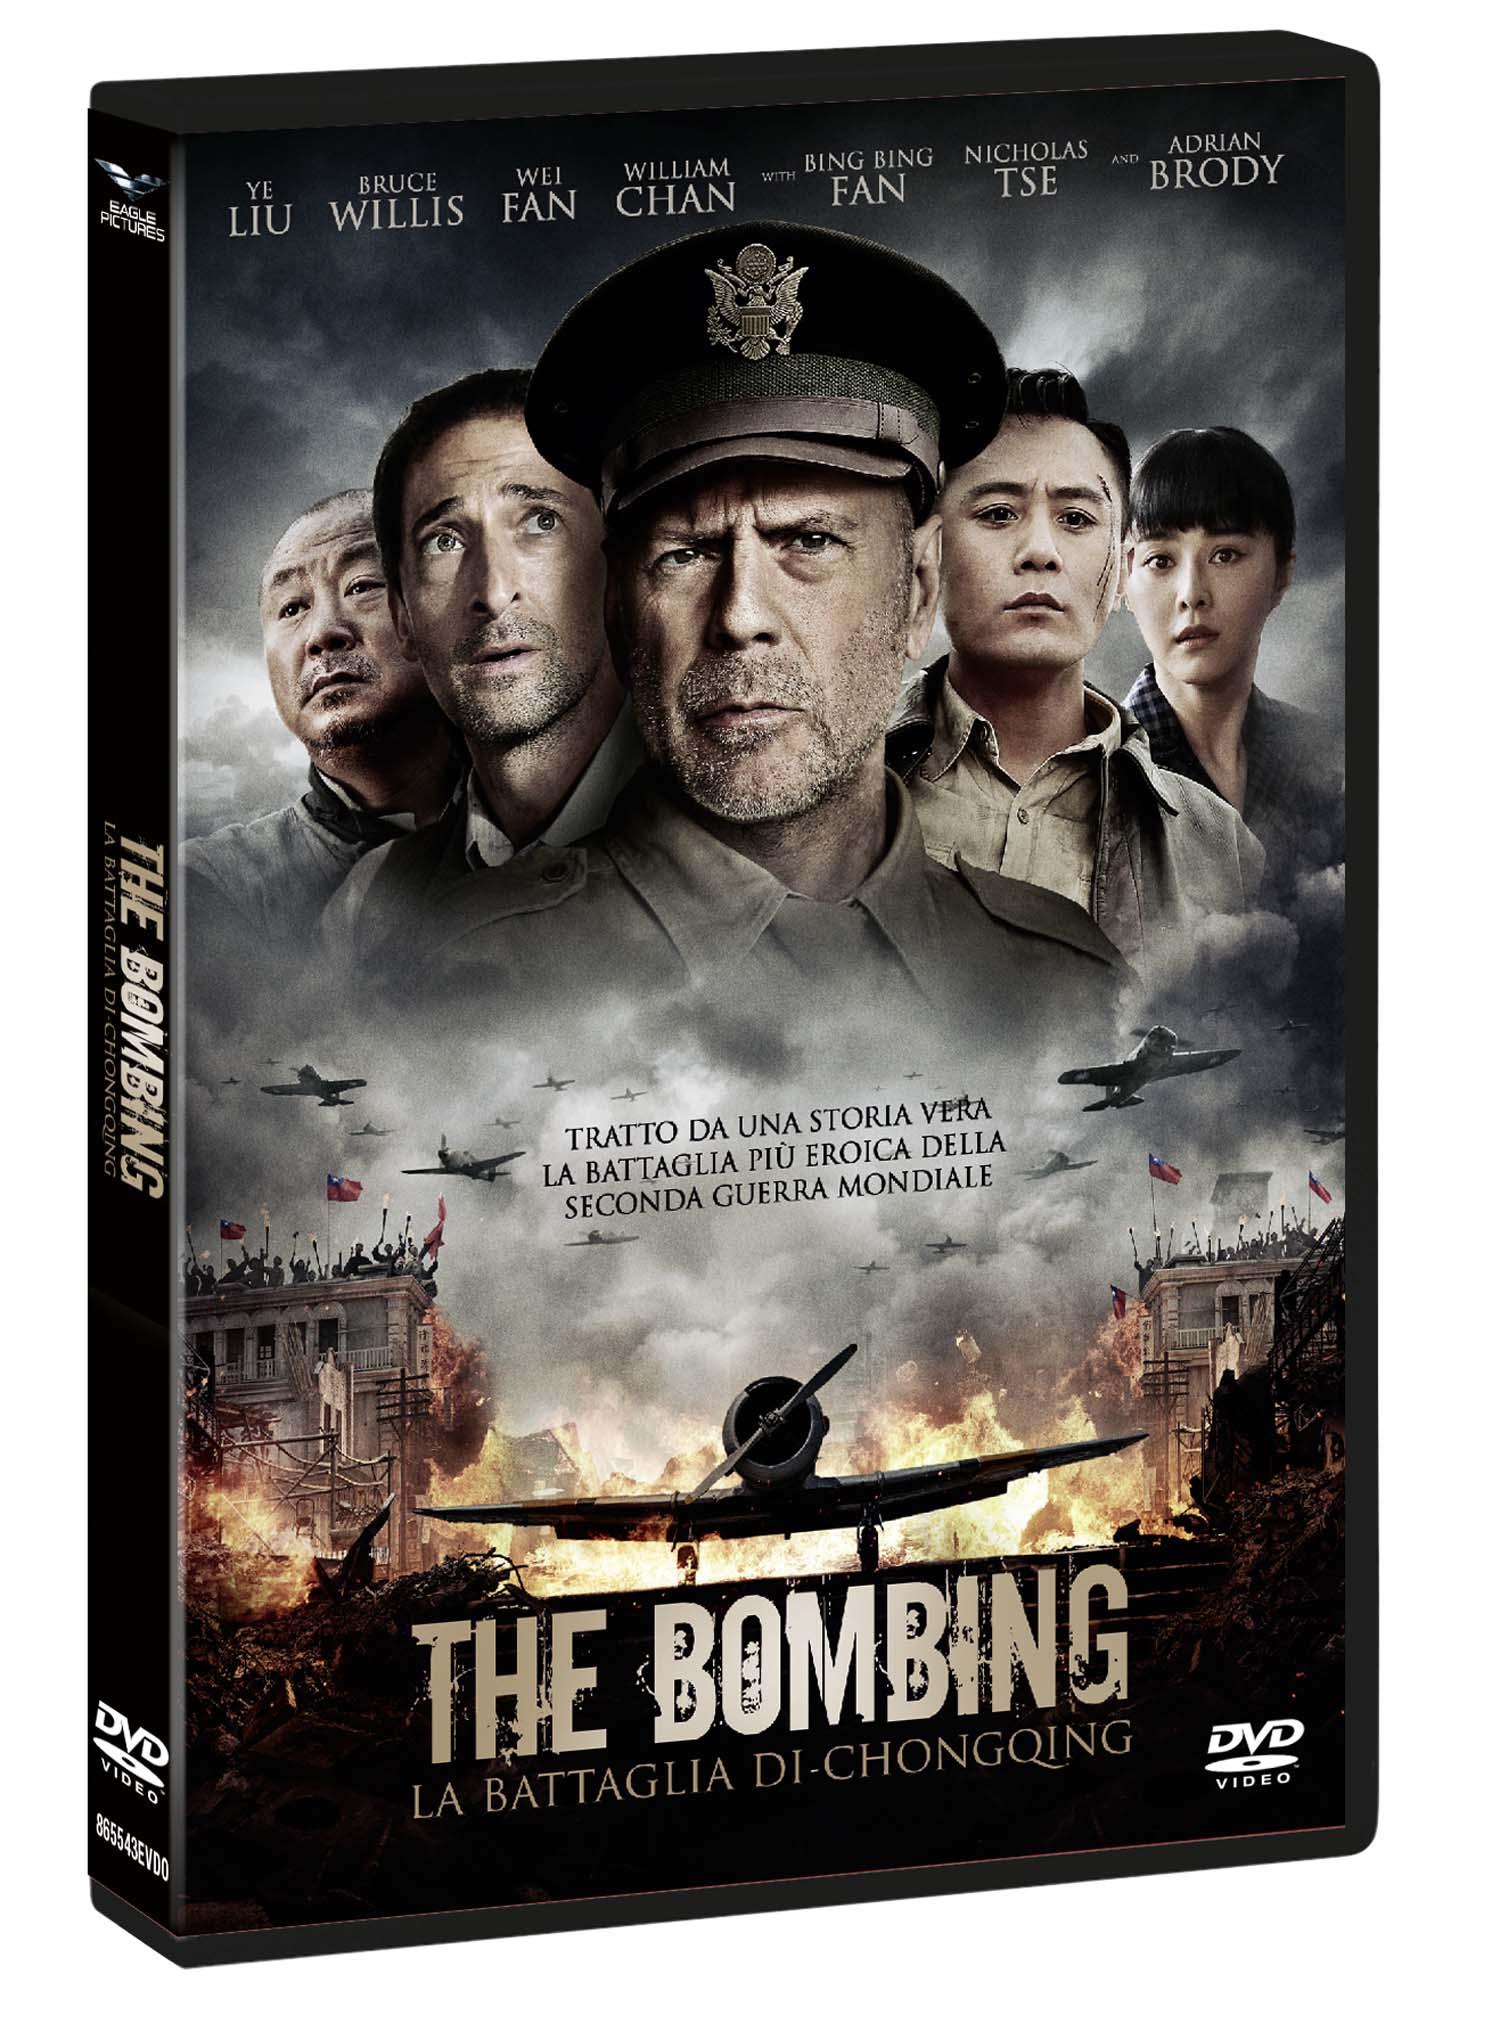 LA BATTAGLIA DI CHONGQING (DVD)